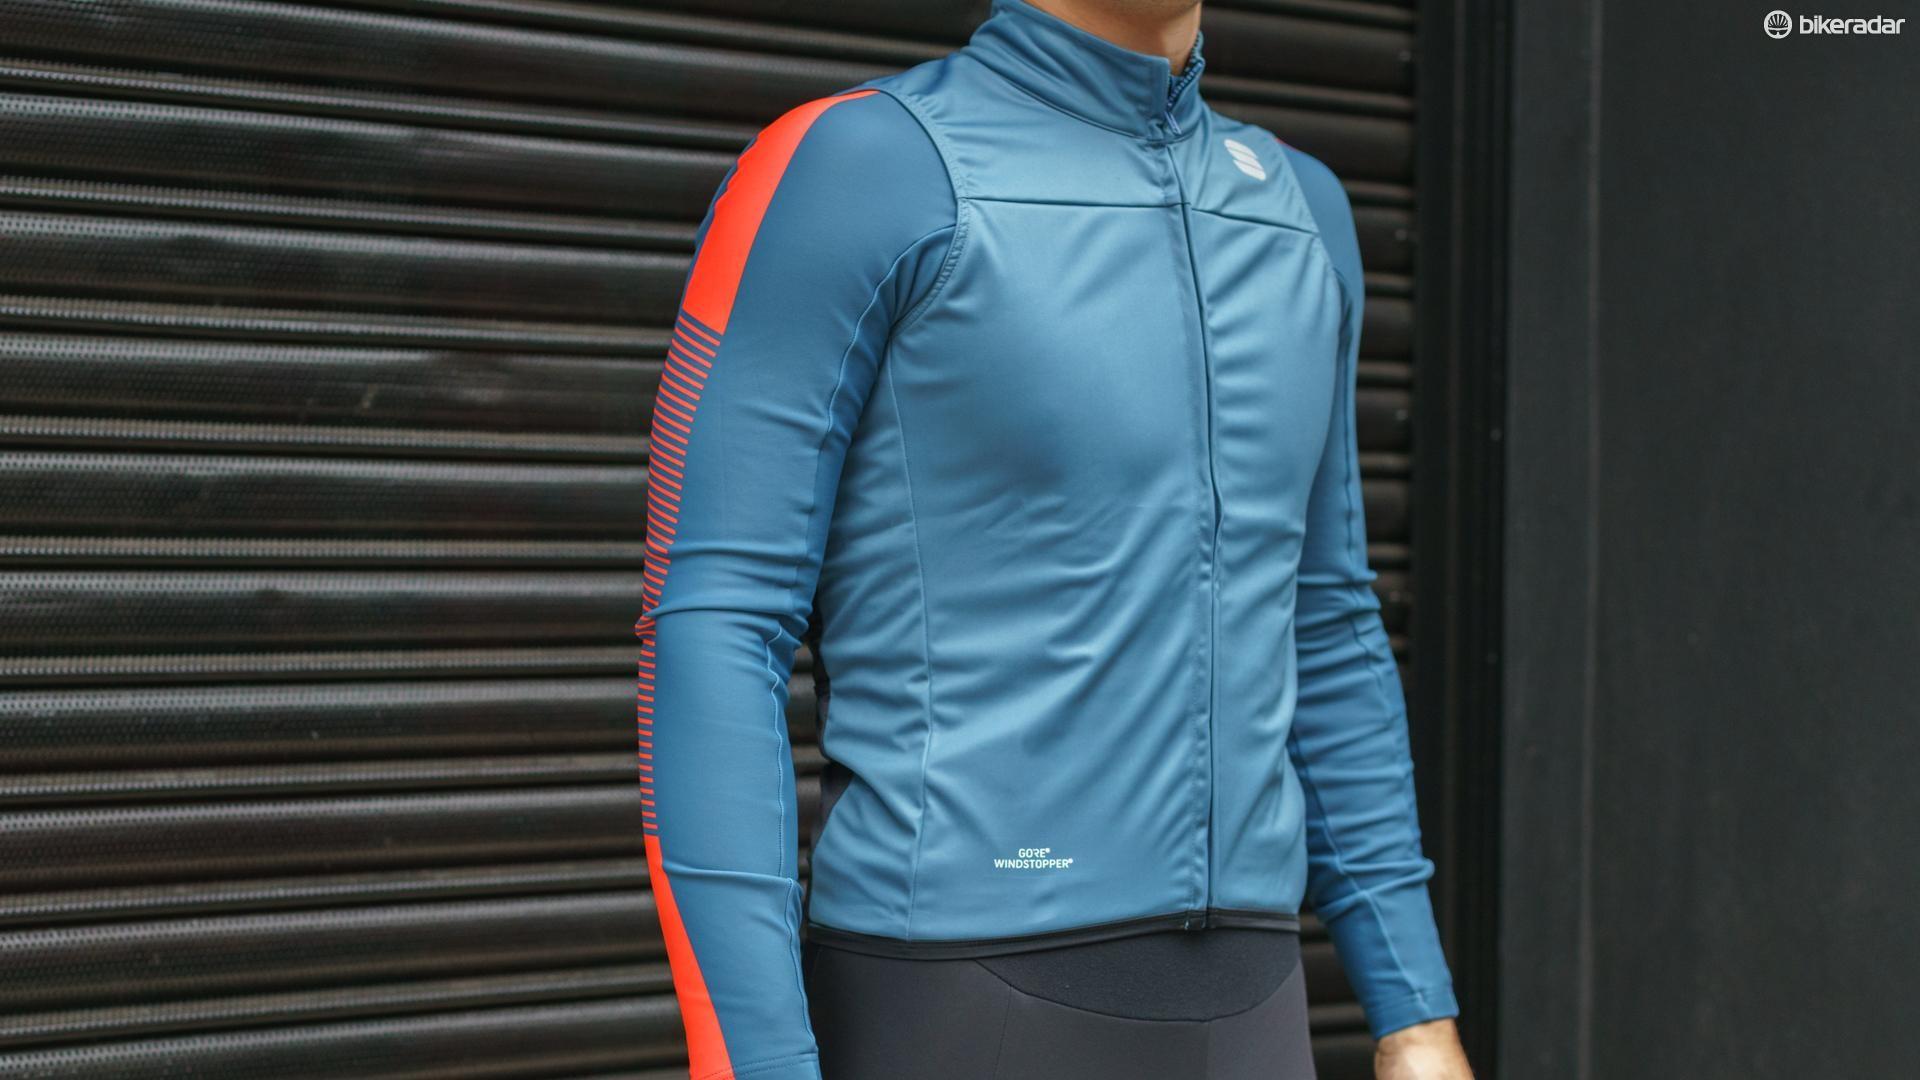 Sportful's BodyFit Pro wind vest worn over the BodyFit Pro Thermal jersey